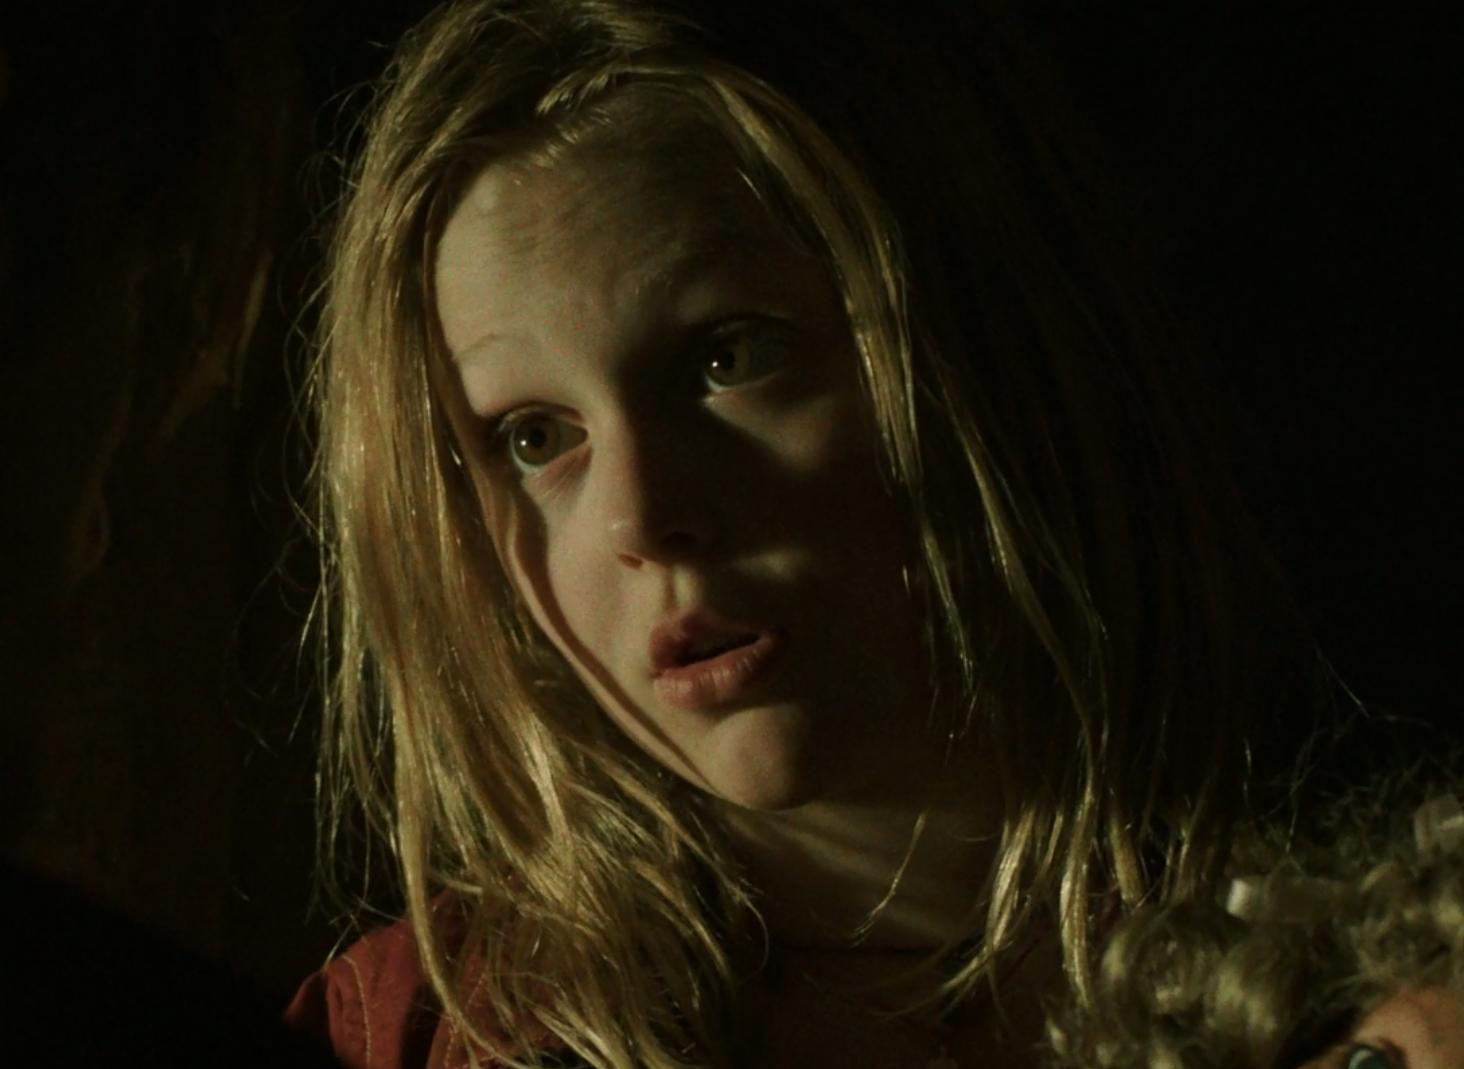 Emily Alyn Lind in Hidden (2015)